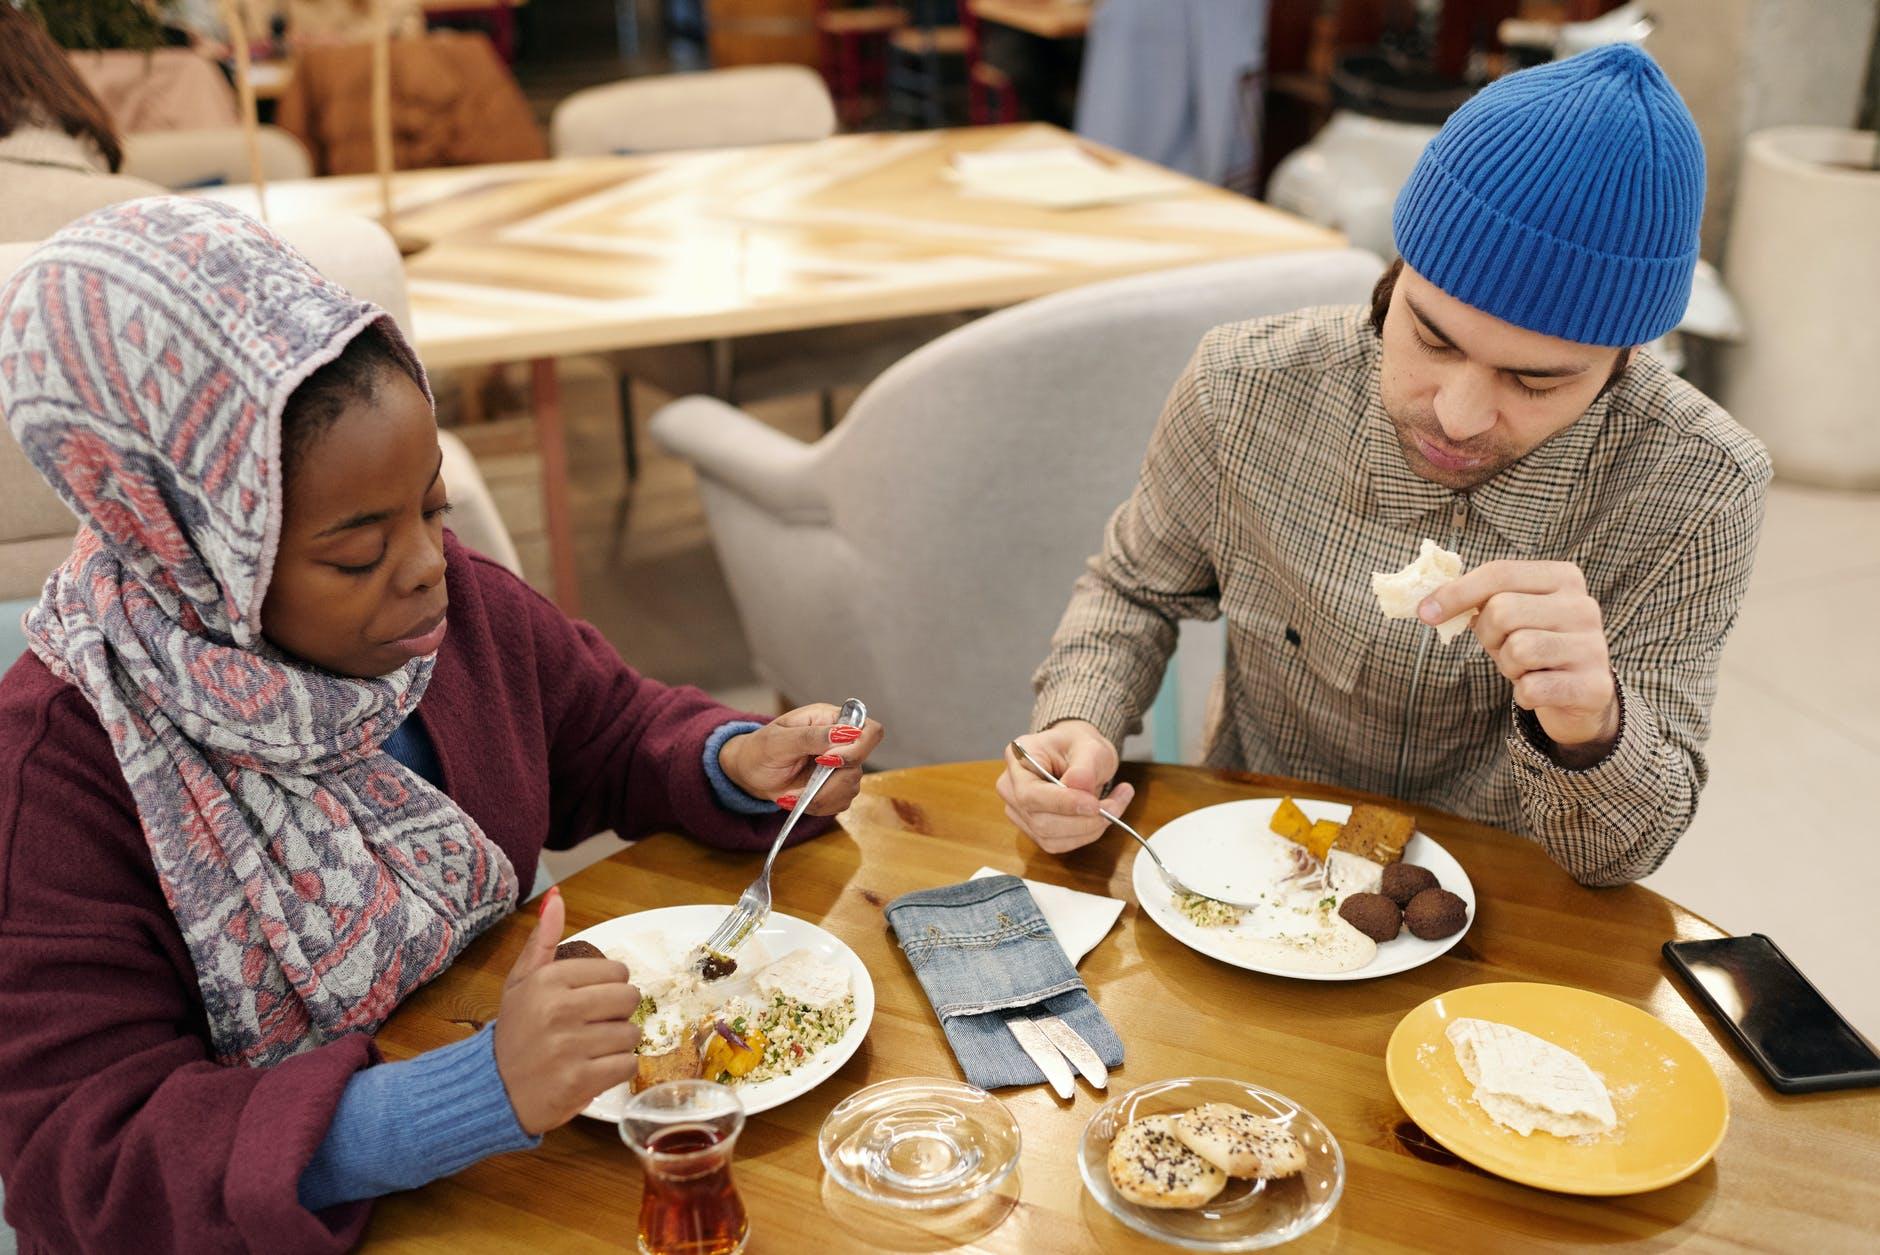 muslim couple eating in restaurant